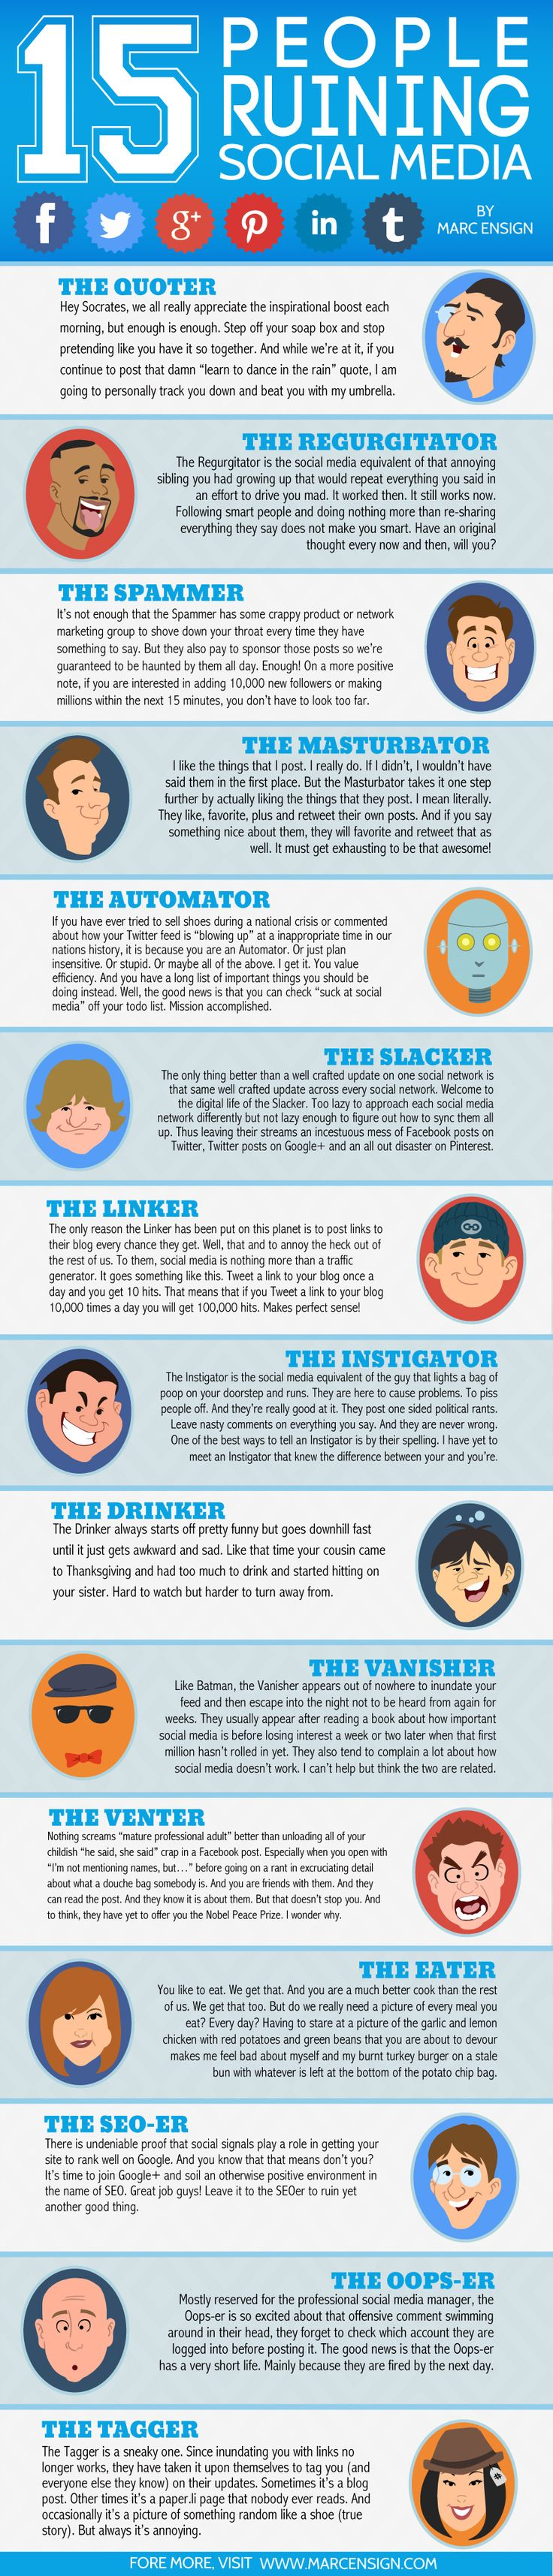 15 People Ruining #SocialMedia